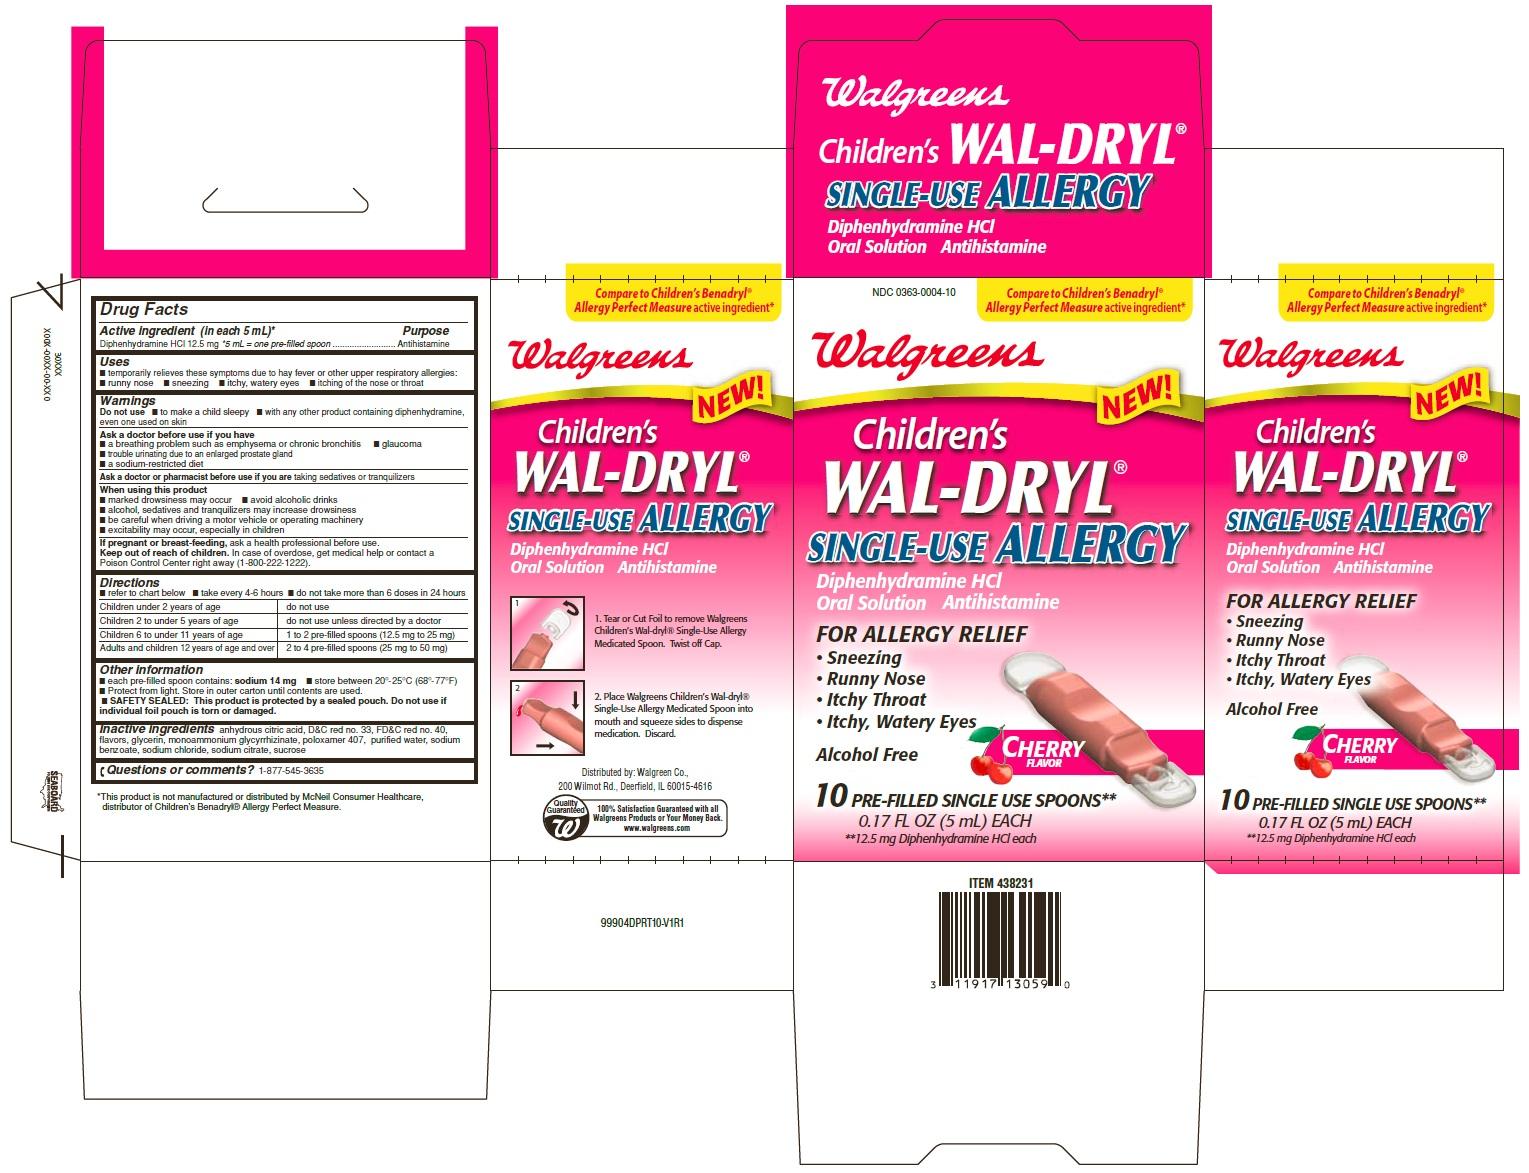 Childrens Wal-dryl Single-use Allergy (Diphenhydramine Hydrochloride) Liquid [Walgreen Company]